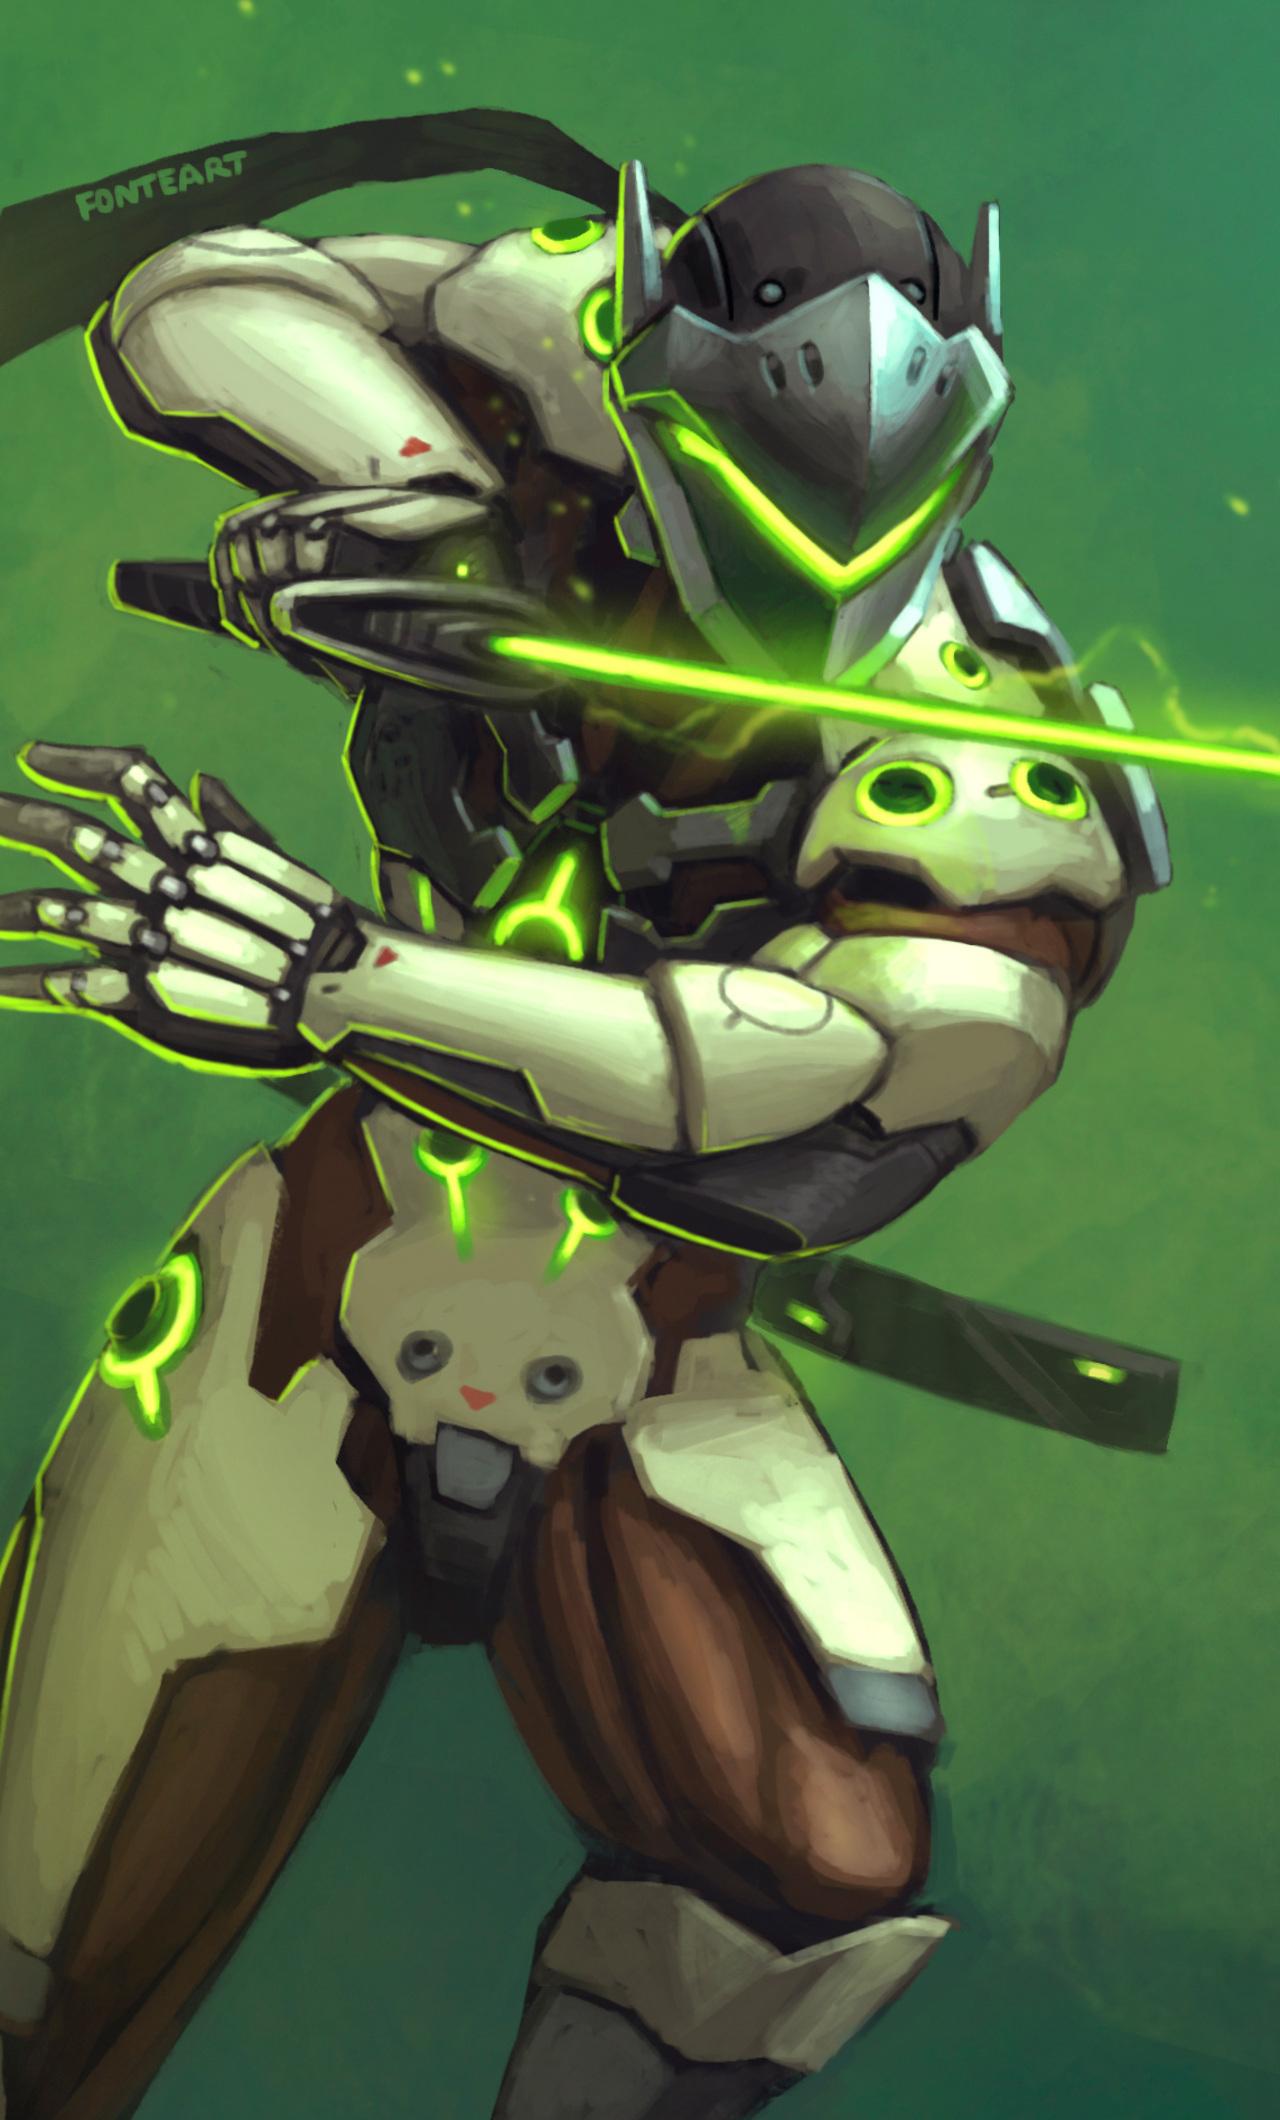 genji-overwatch-warrior-sword-ko.jpg